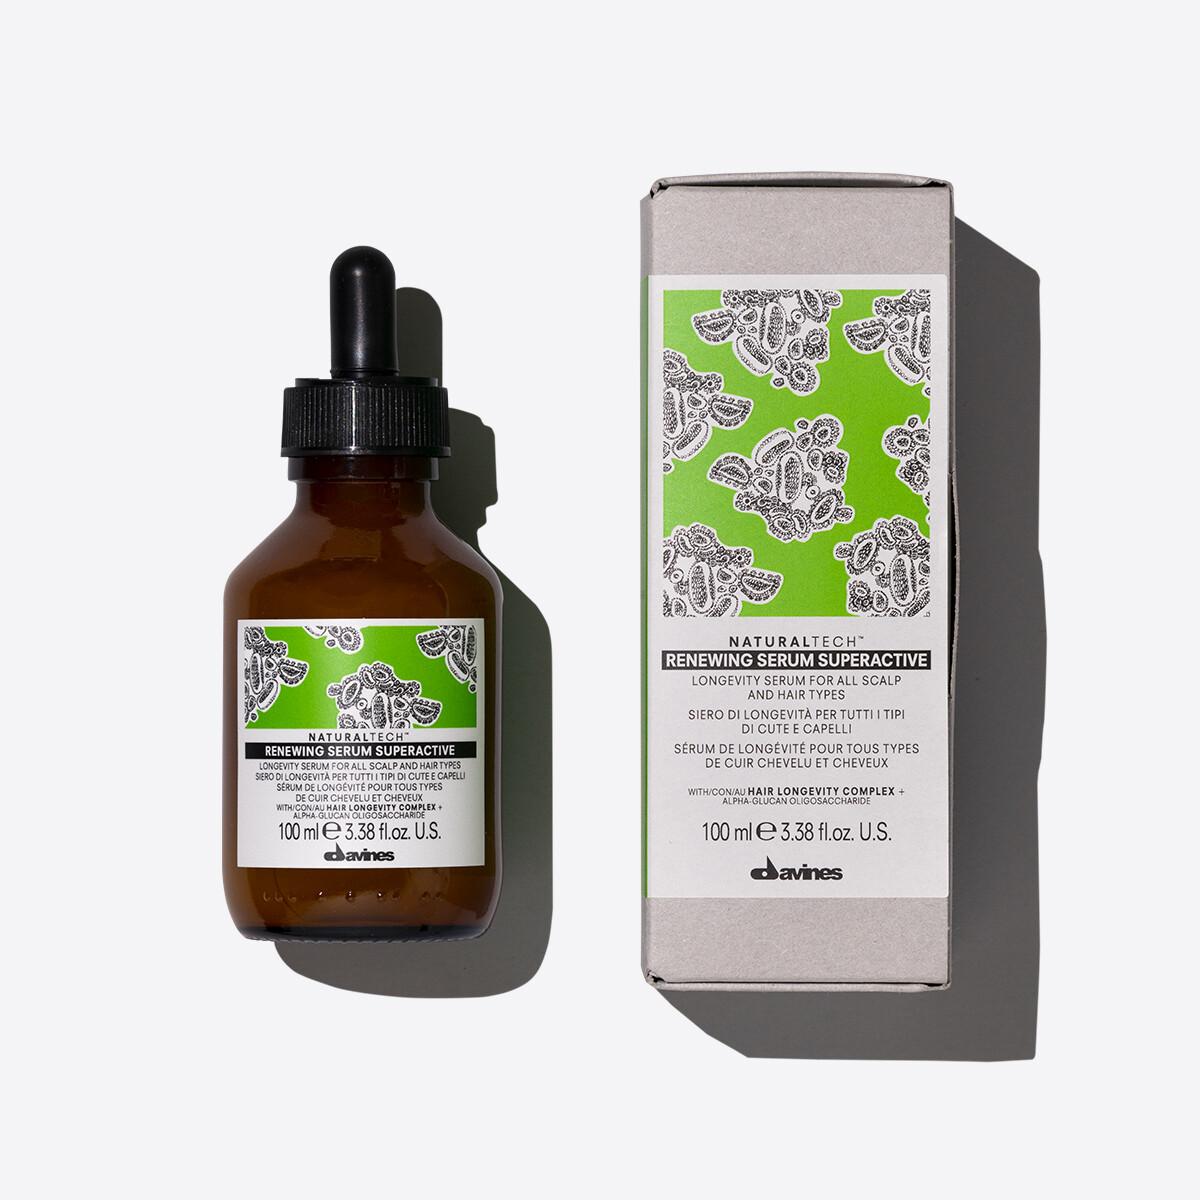 Davines Renewing Serum Superactive 100 ml | Longevidad Capilar